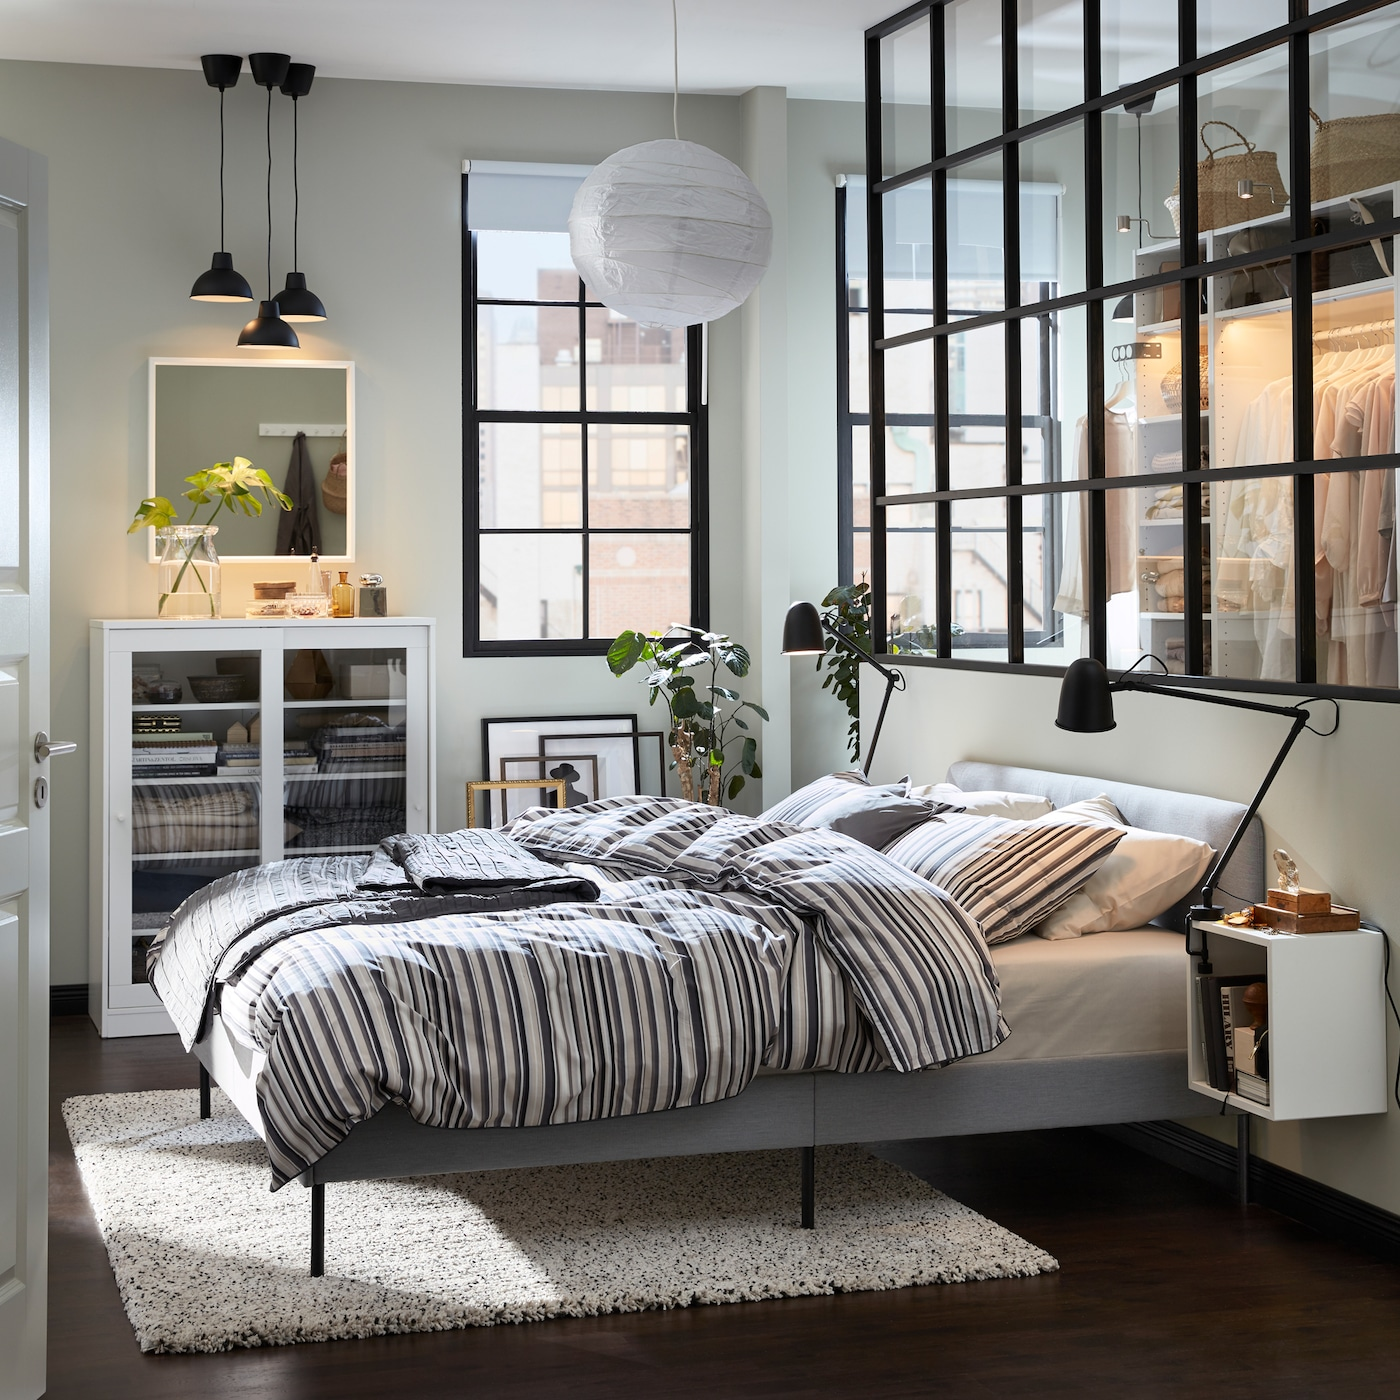 The urban chic bedroom - IKEA